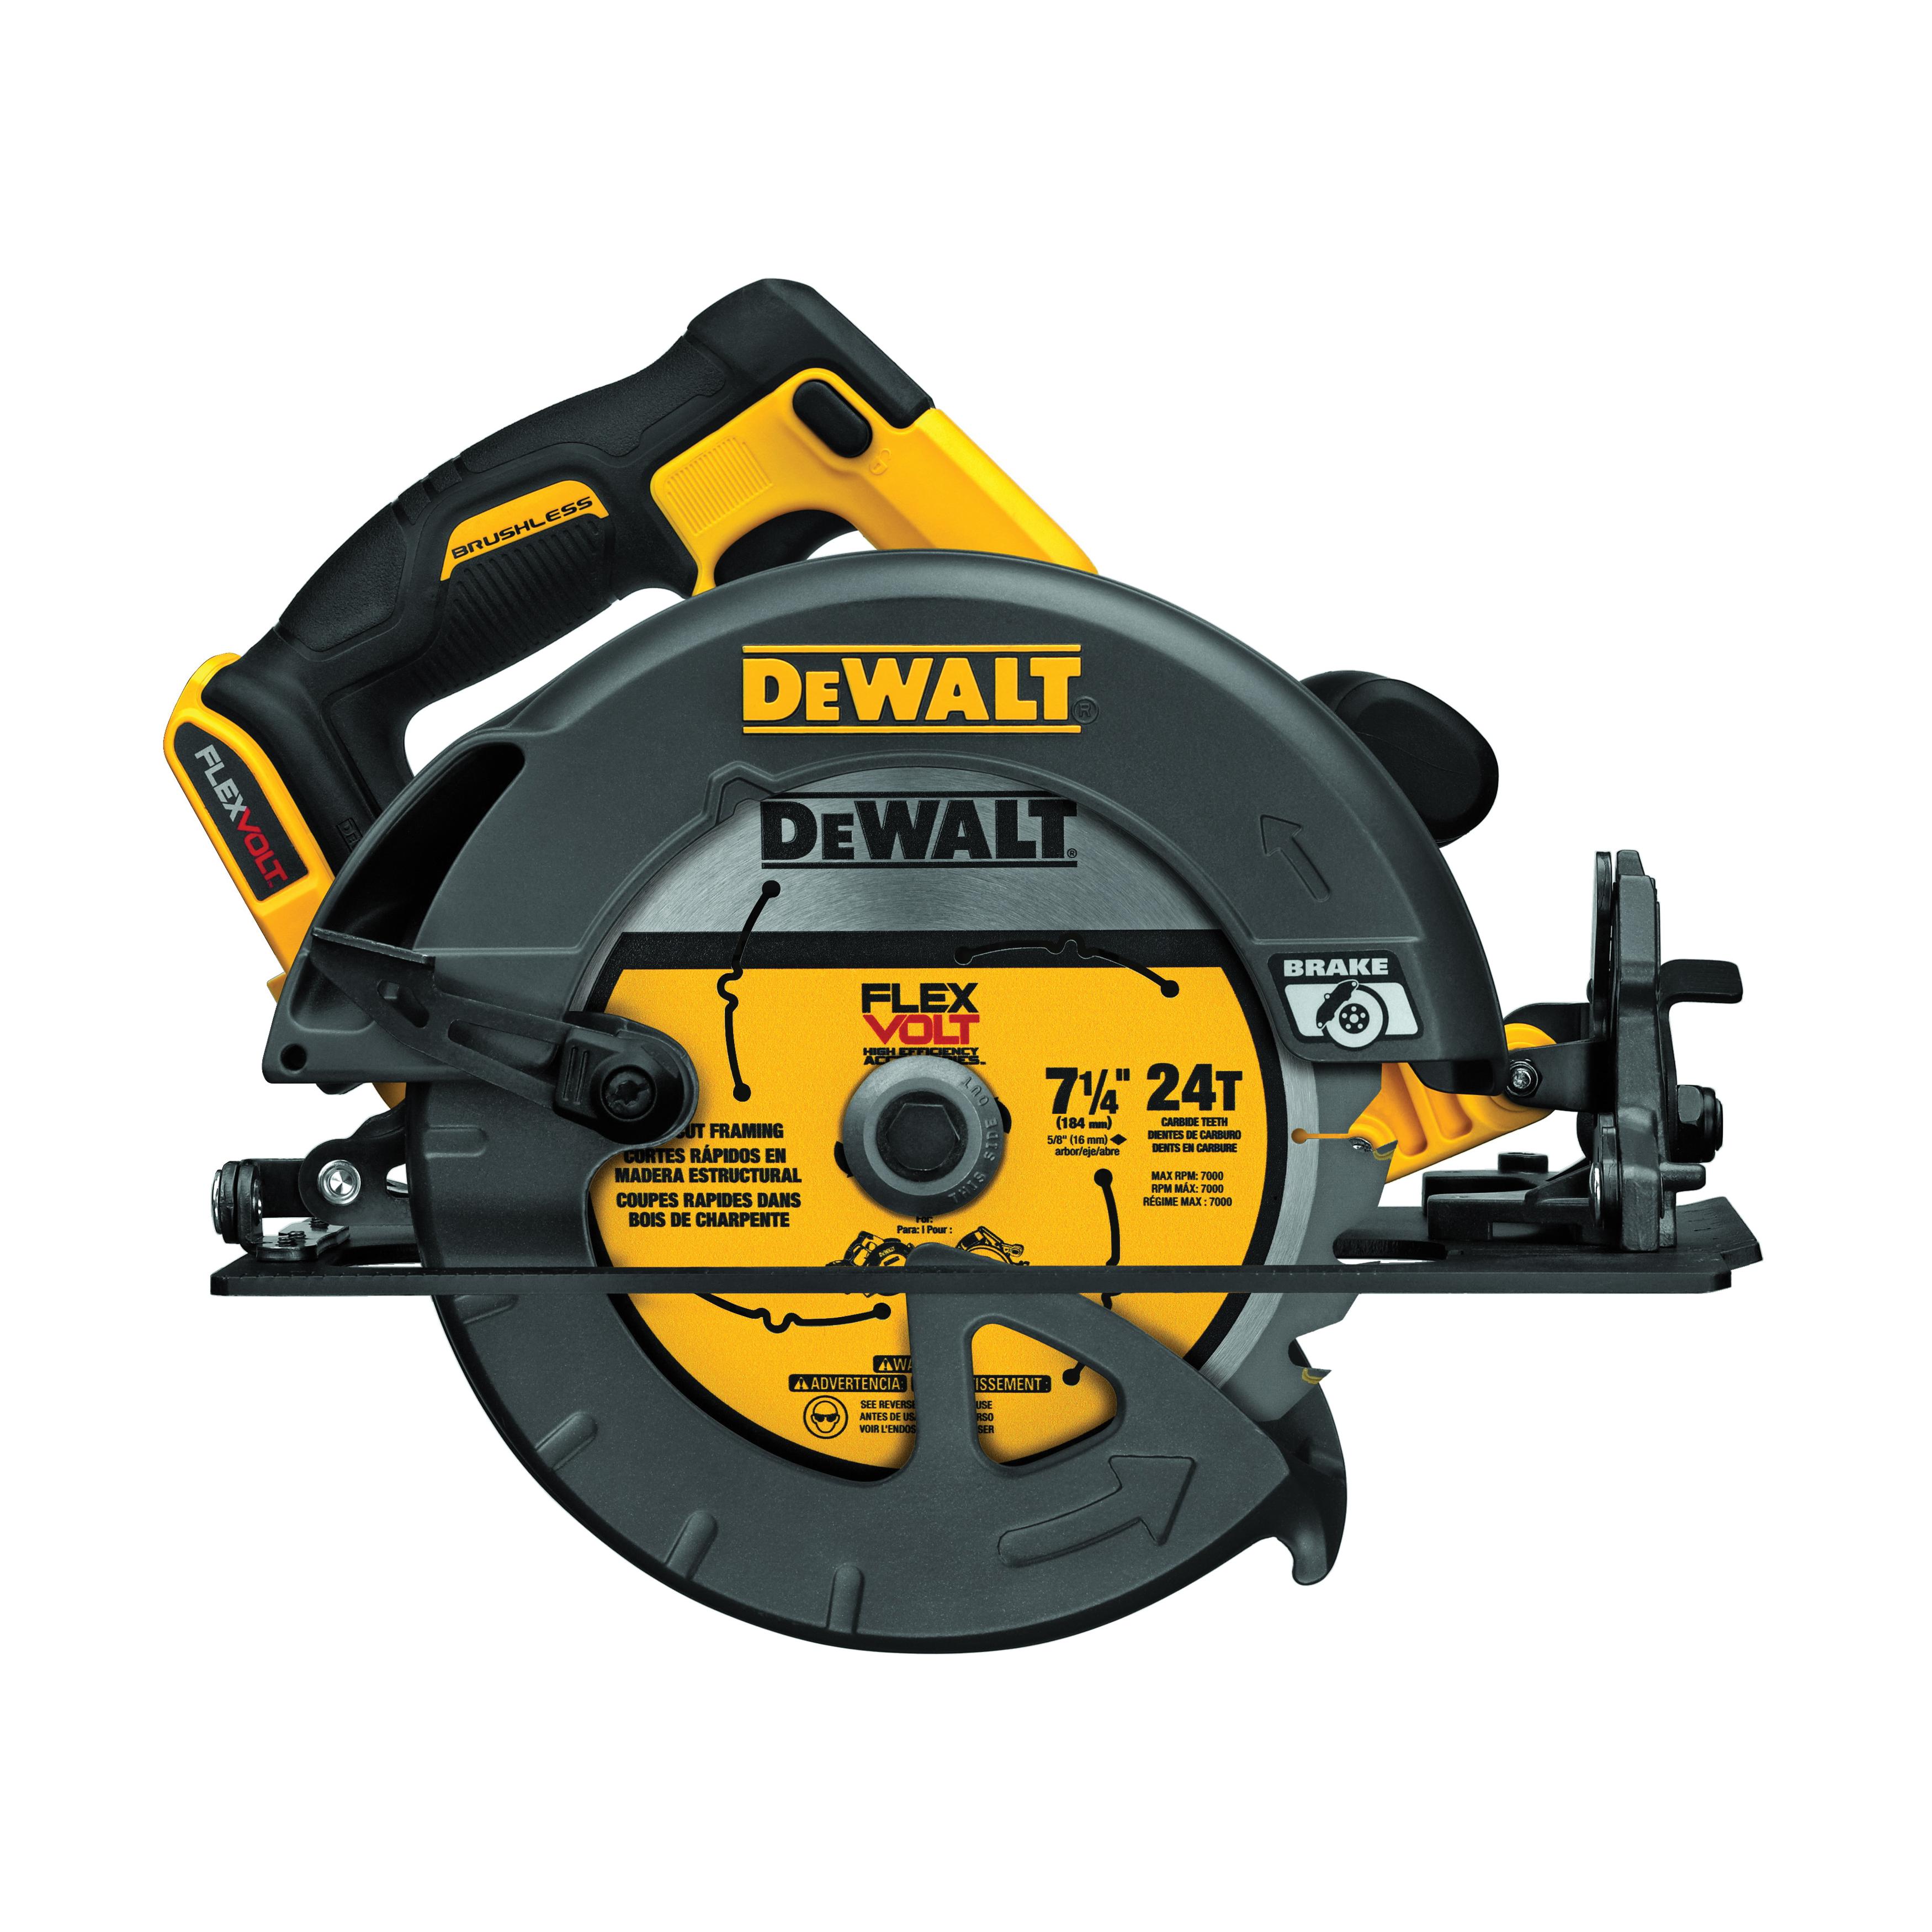 DeWALT® 60V MAX* FLEXVOLT™ DCS575B Brushless Cordless Circular Saw With Brake Bare, 7-1/4 in Blade, 5/8 in Arbor/Shank, 60 V, 1-5/8 in at 45 deg, 2-9/16 in at 90 deg D Cutting, Lithium-Ion Battery, Right Blade Side, Bare Tool